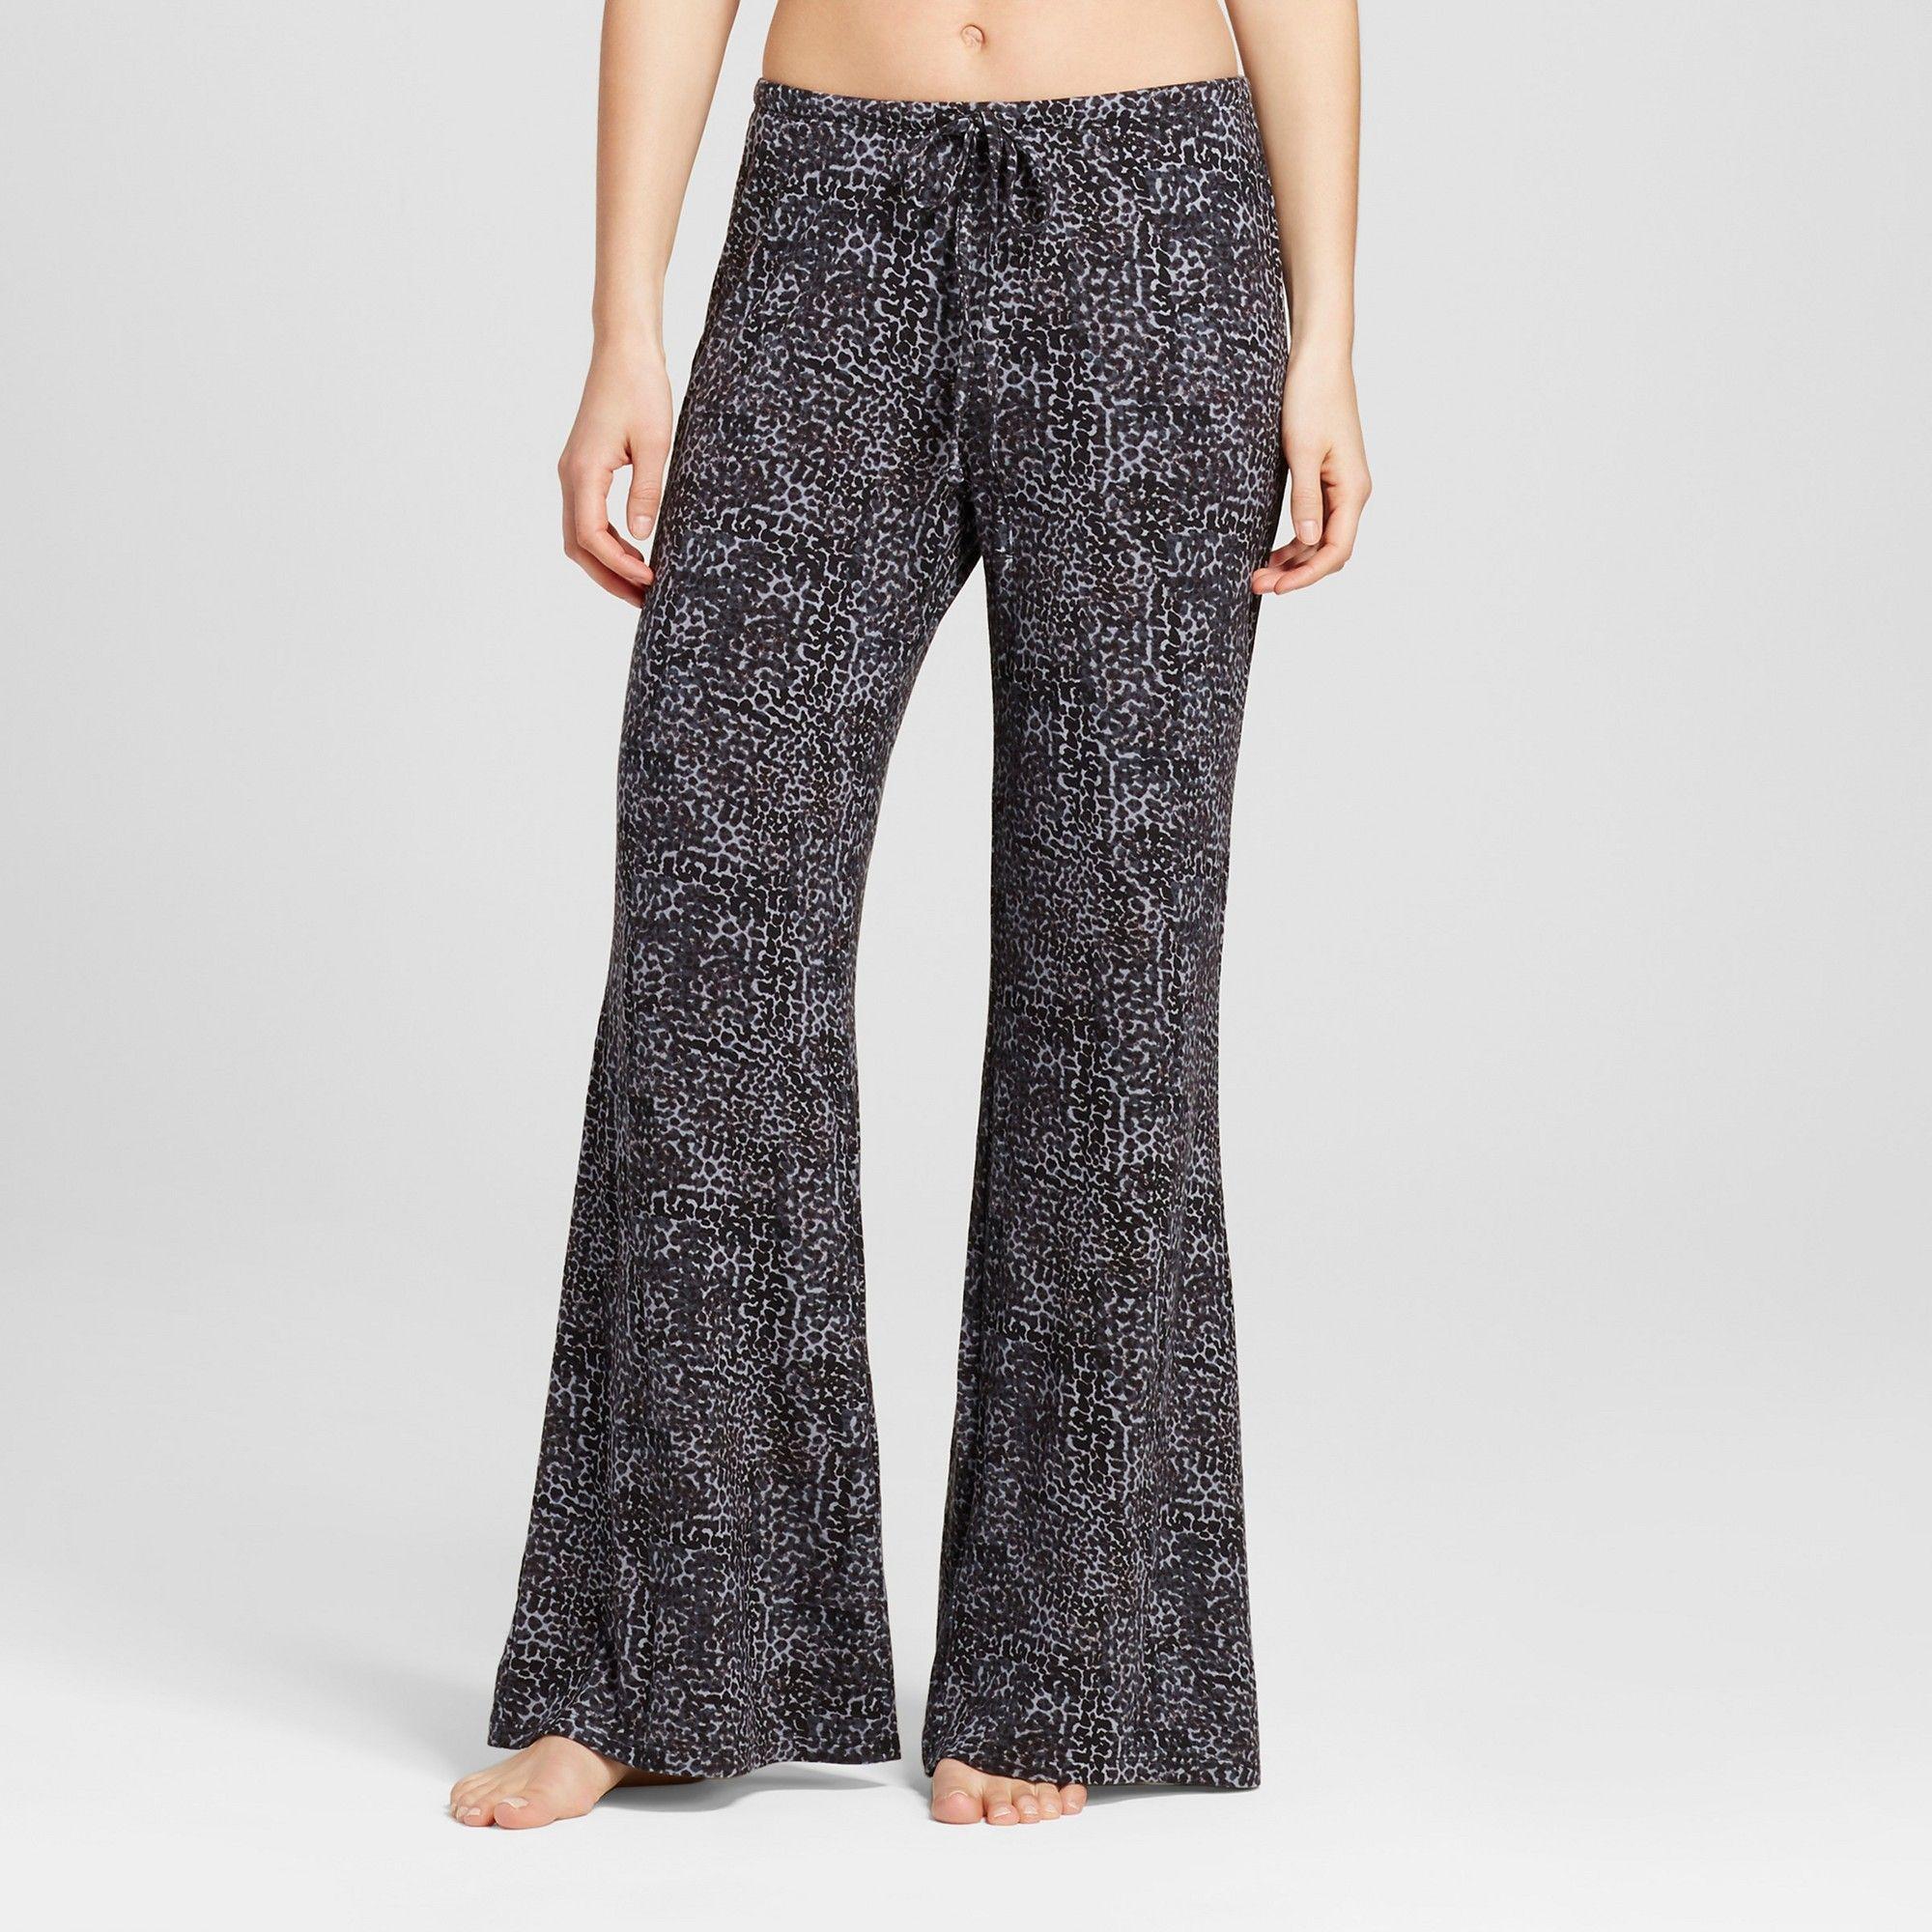 12ee6711e39f0 Women s Wide Leg Pajama Pants - Total Comfort Black Xxl - Shorts ...